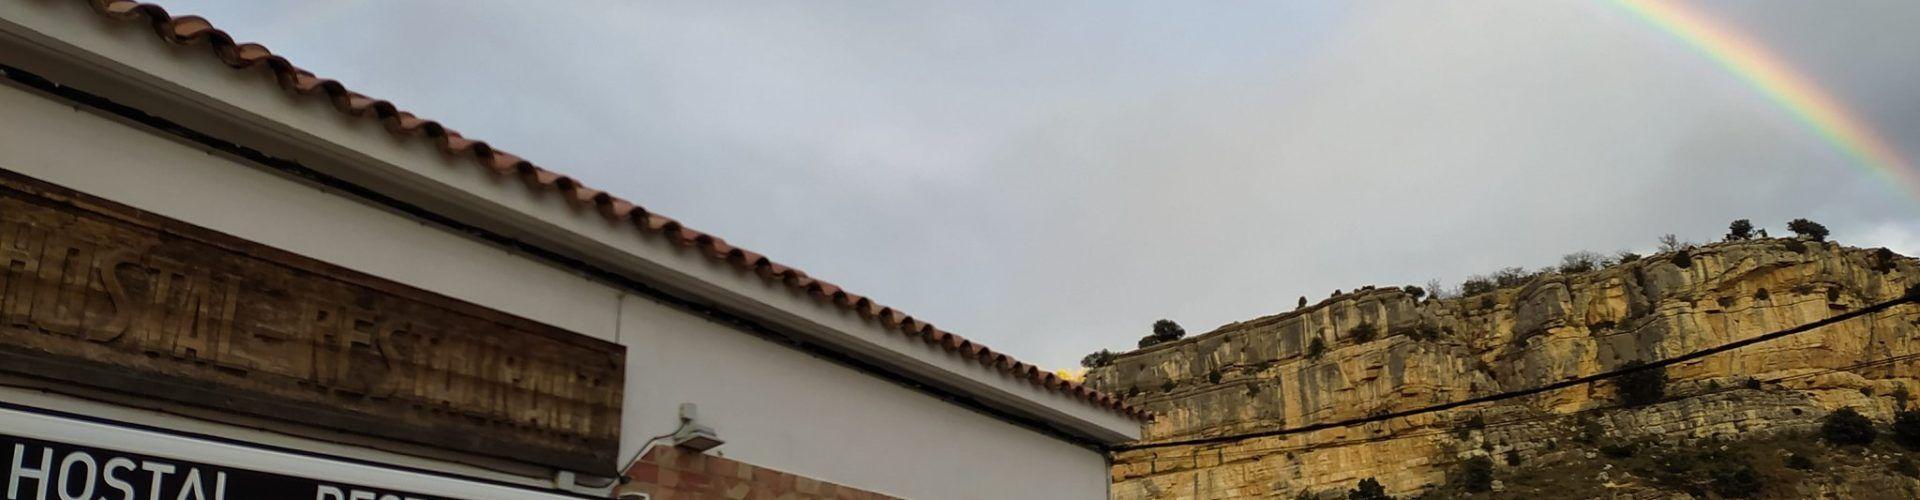 Fotos: arc de Sant Martí a Vallibona